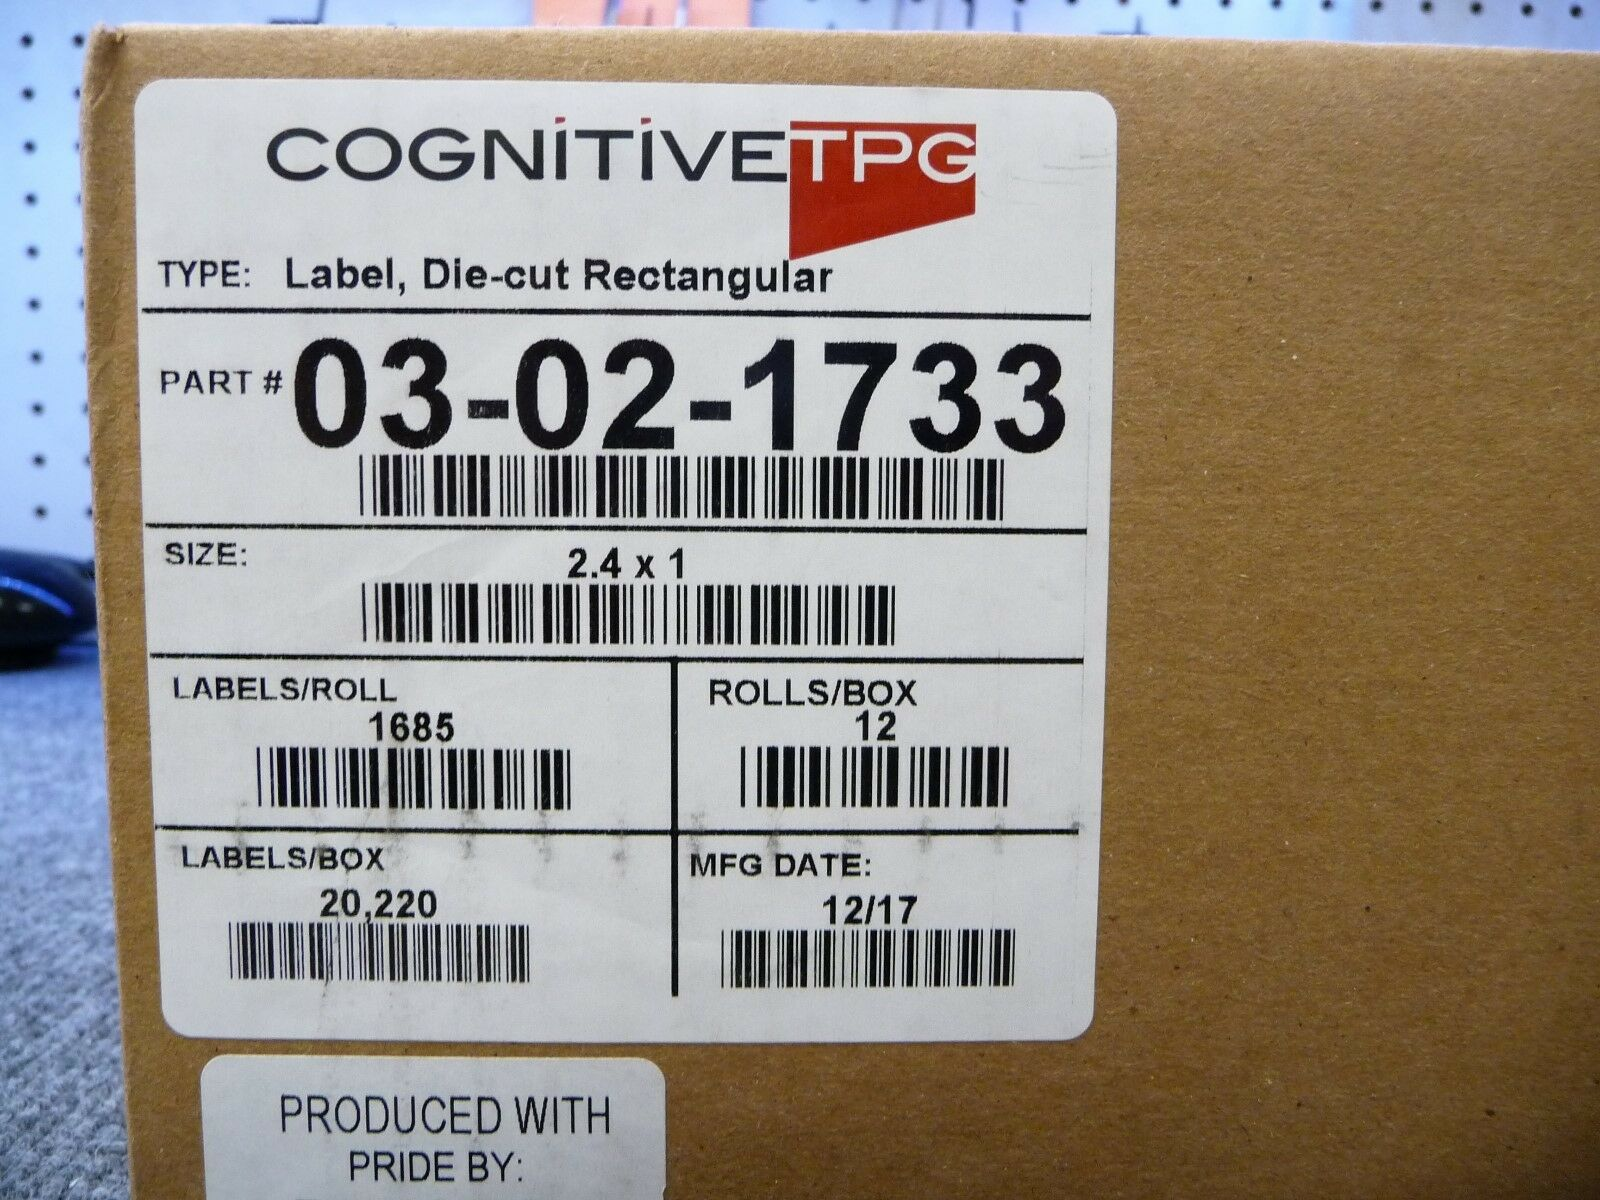 Cognitive TPG 03-02-1733 Thermal Transfer Vinyl Labels - 2.40  Width x 1  Length